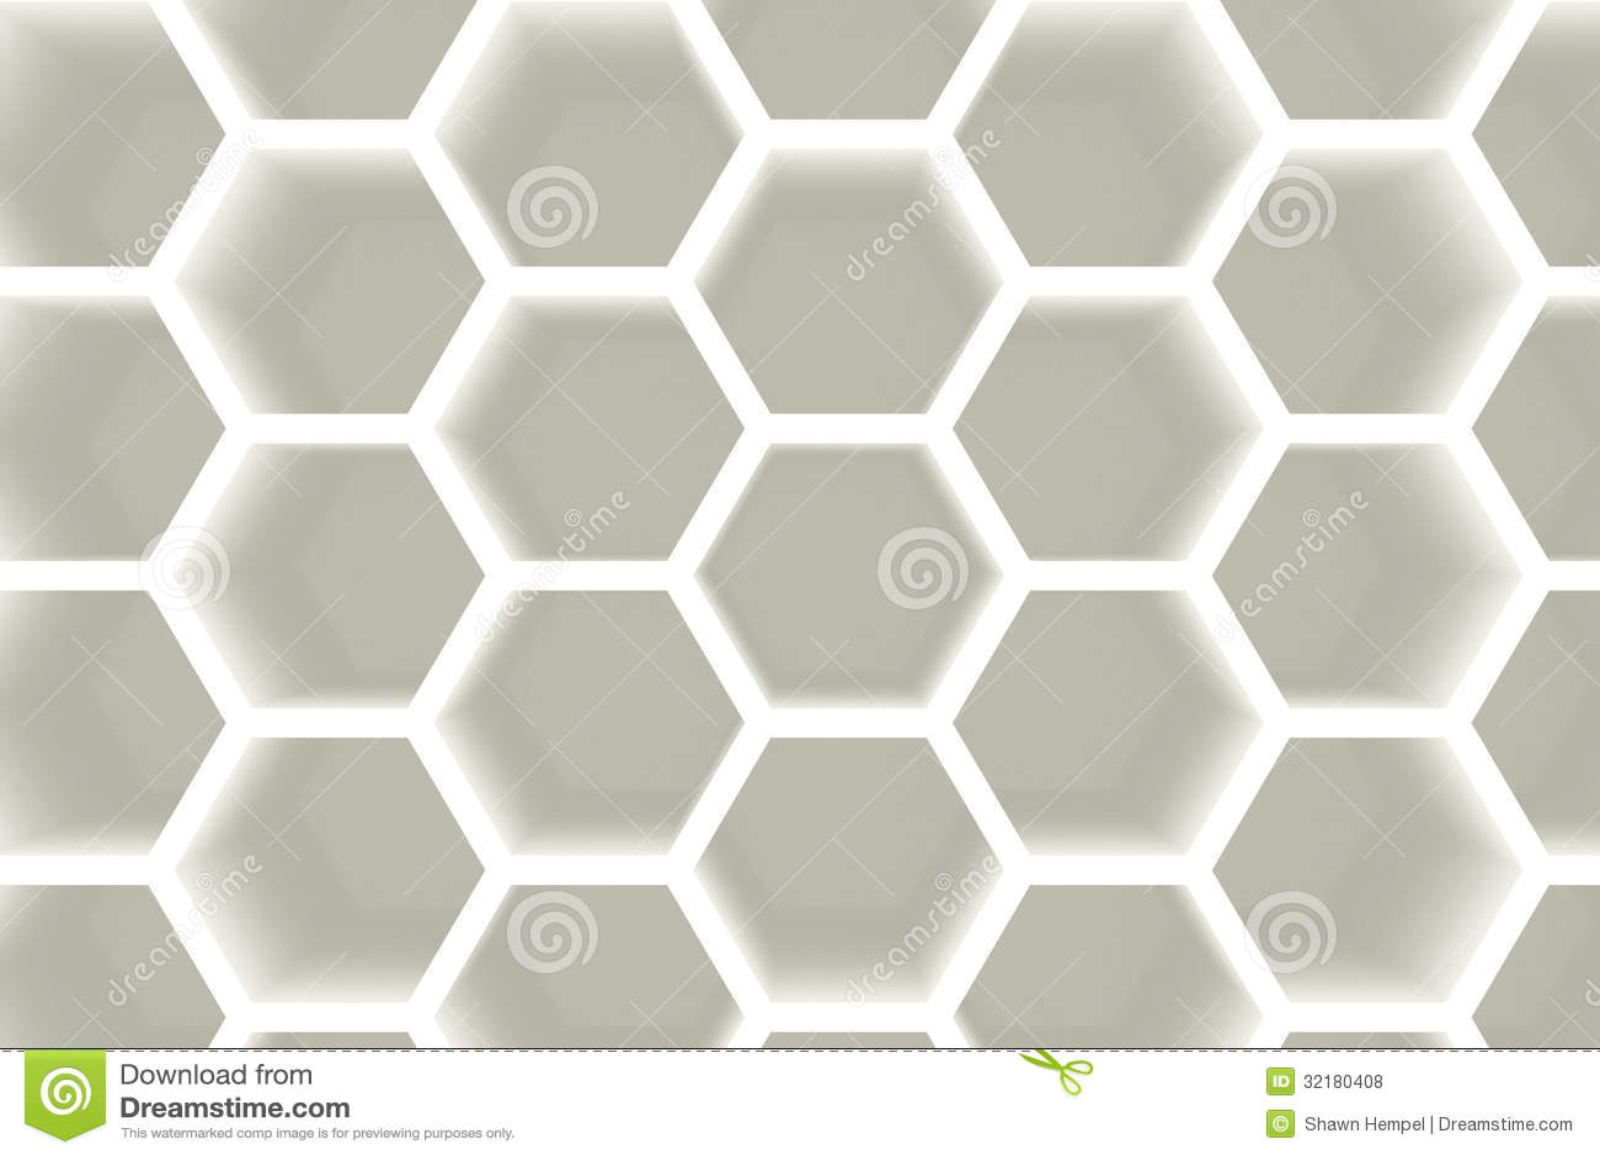 Modern Hexagon Shelves Background Royalty Free Stock